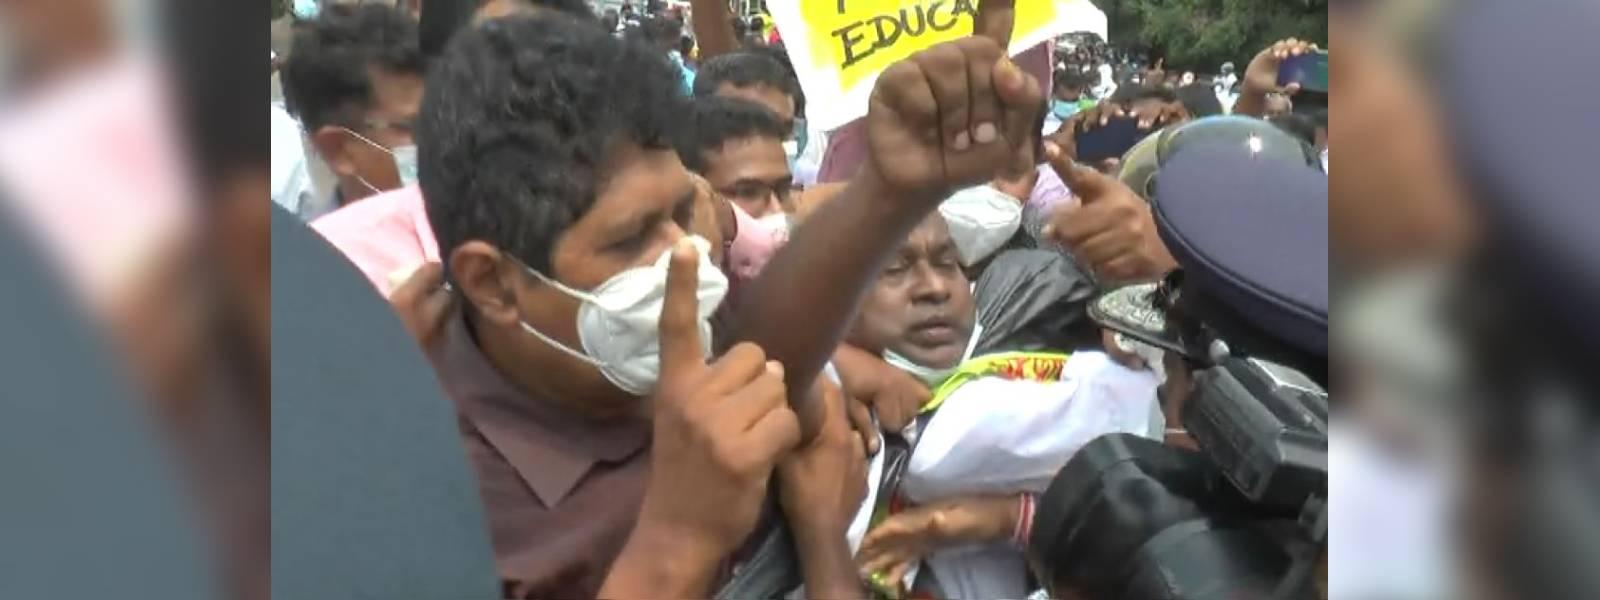 Teachers unions clash opposite education ministry